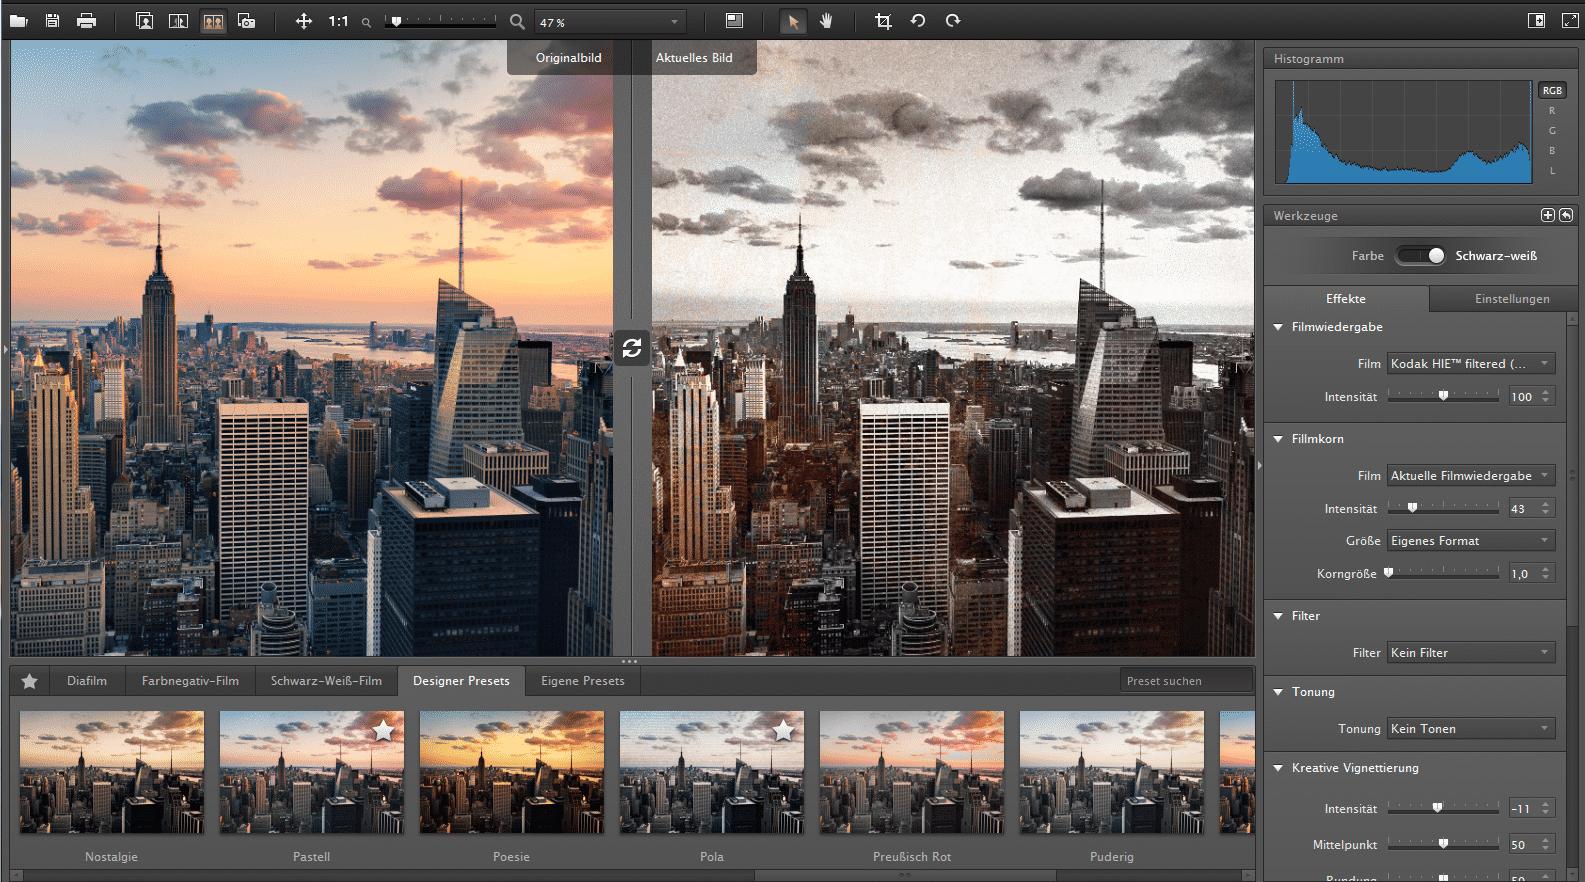 Simulation analoger Fotofilme | heise online